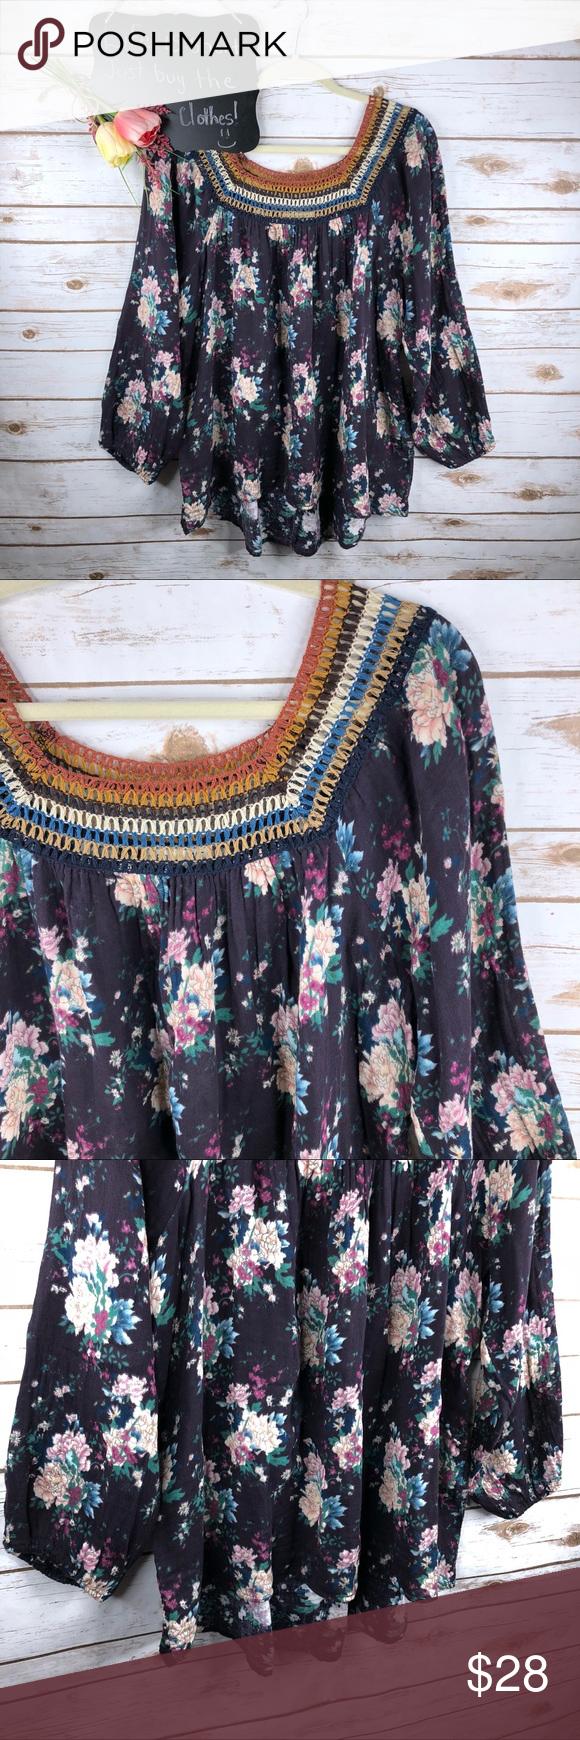 Tassels Lace Floral Gauzy Cotton 3 4 Sleeve Top Fashion Clothes Design Lace Top Blouse